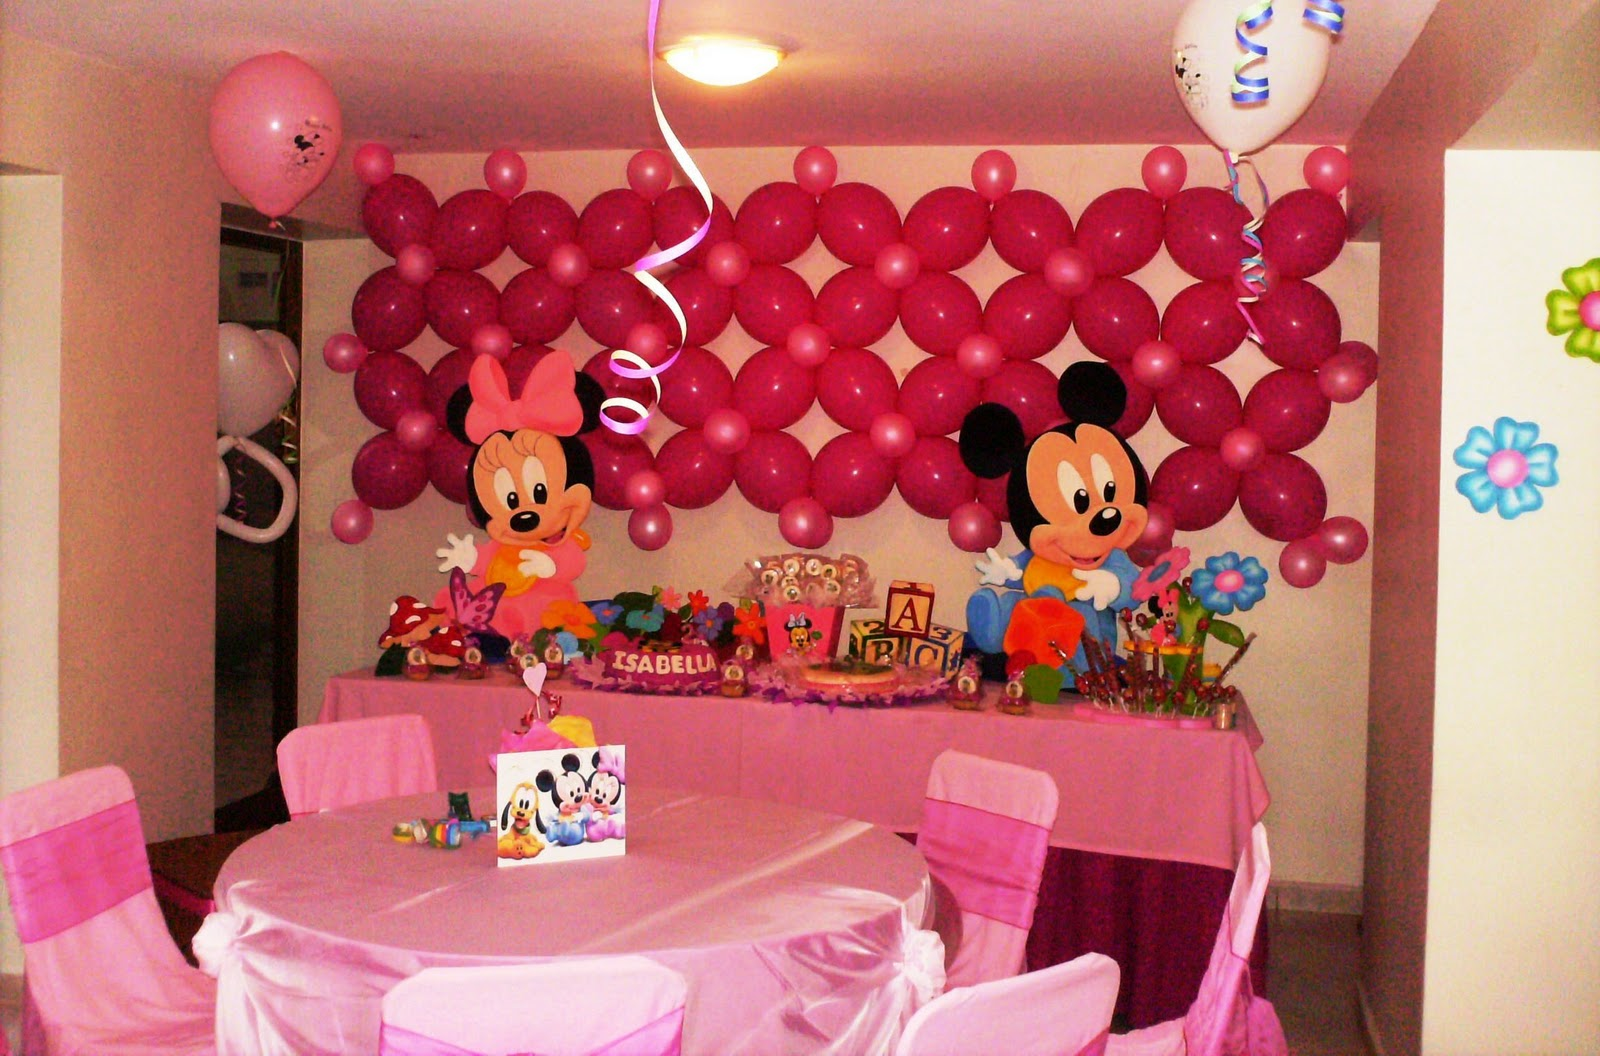 De decoracion de fiestas infantiles for Decoracion para pared fiesta